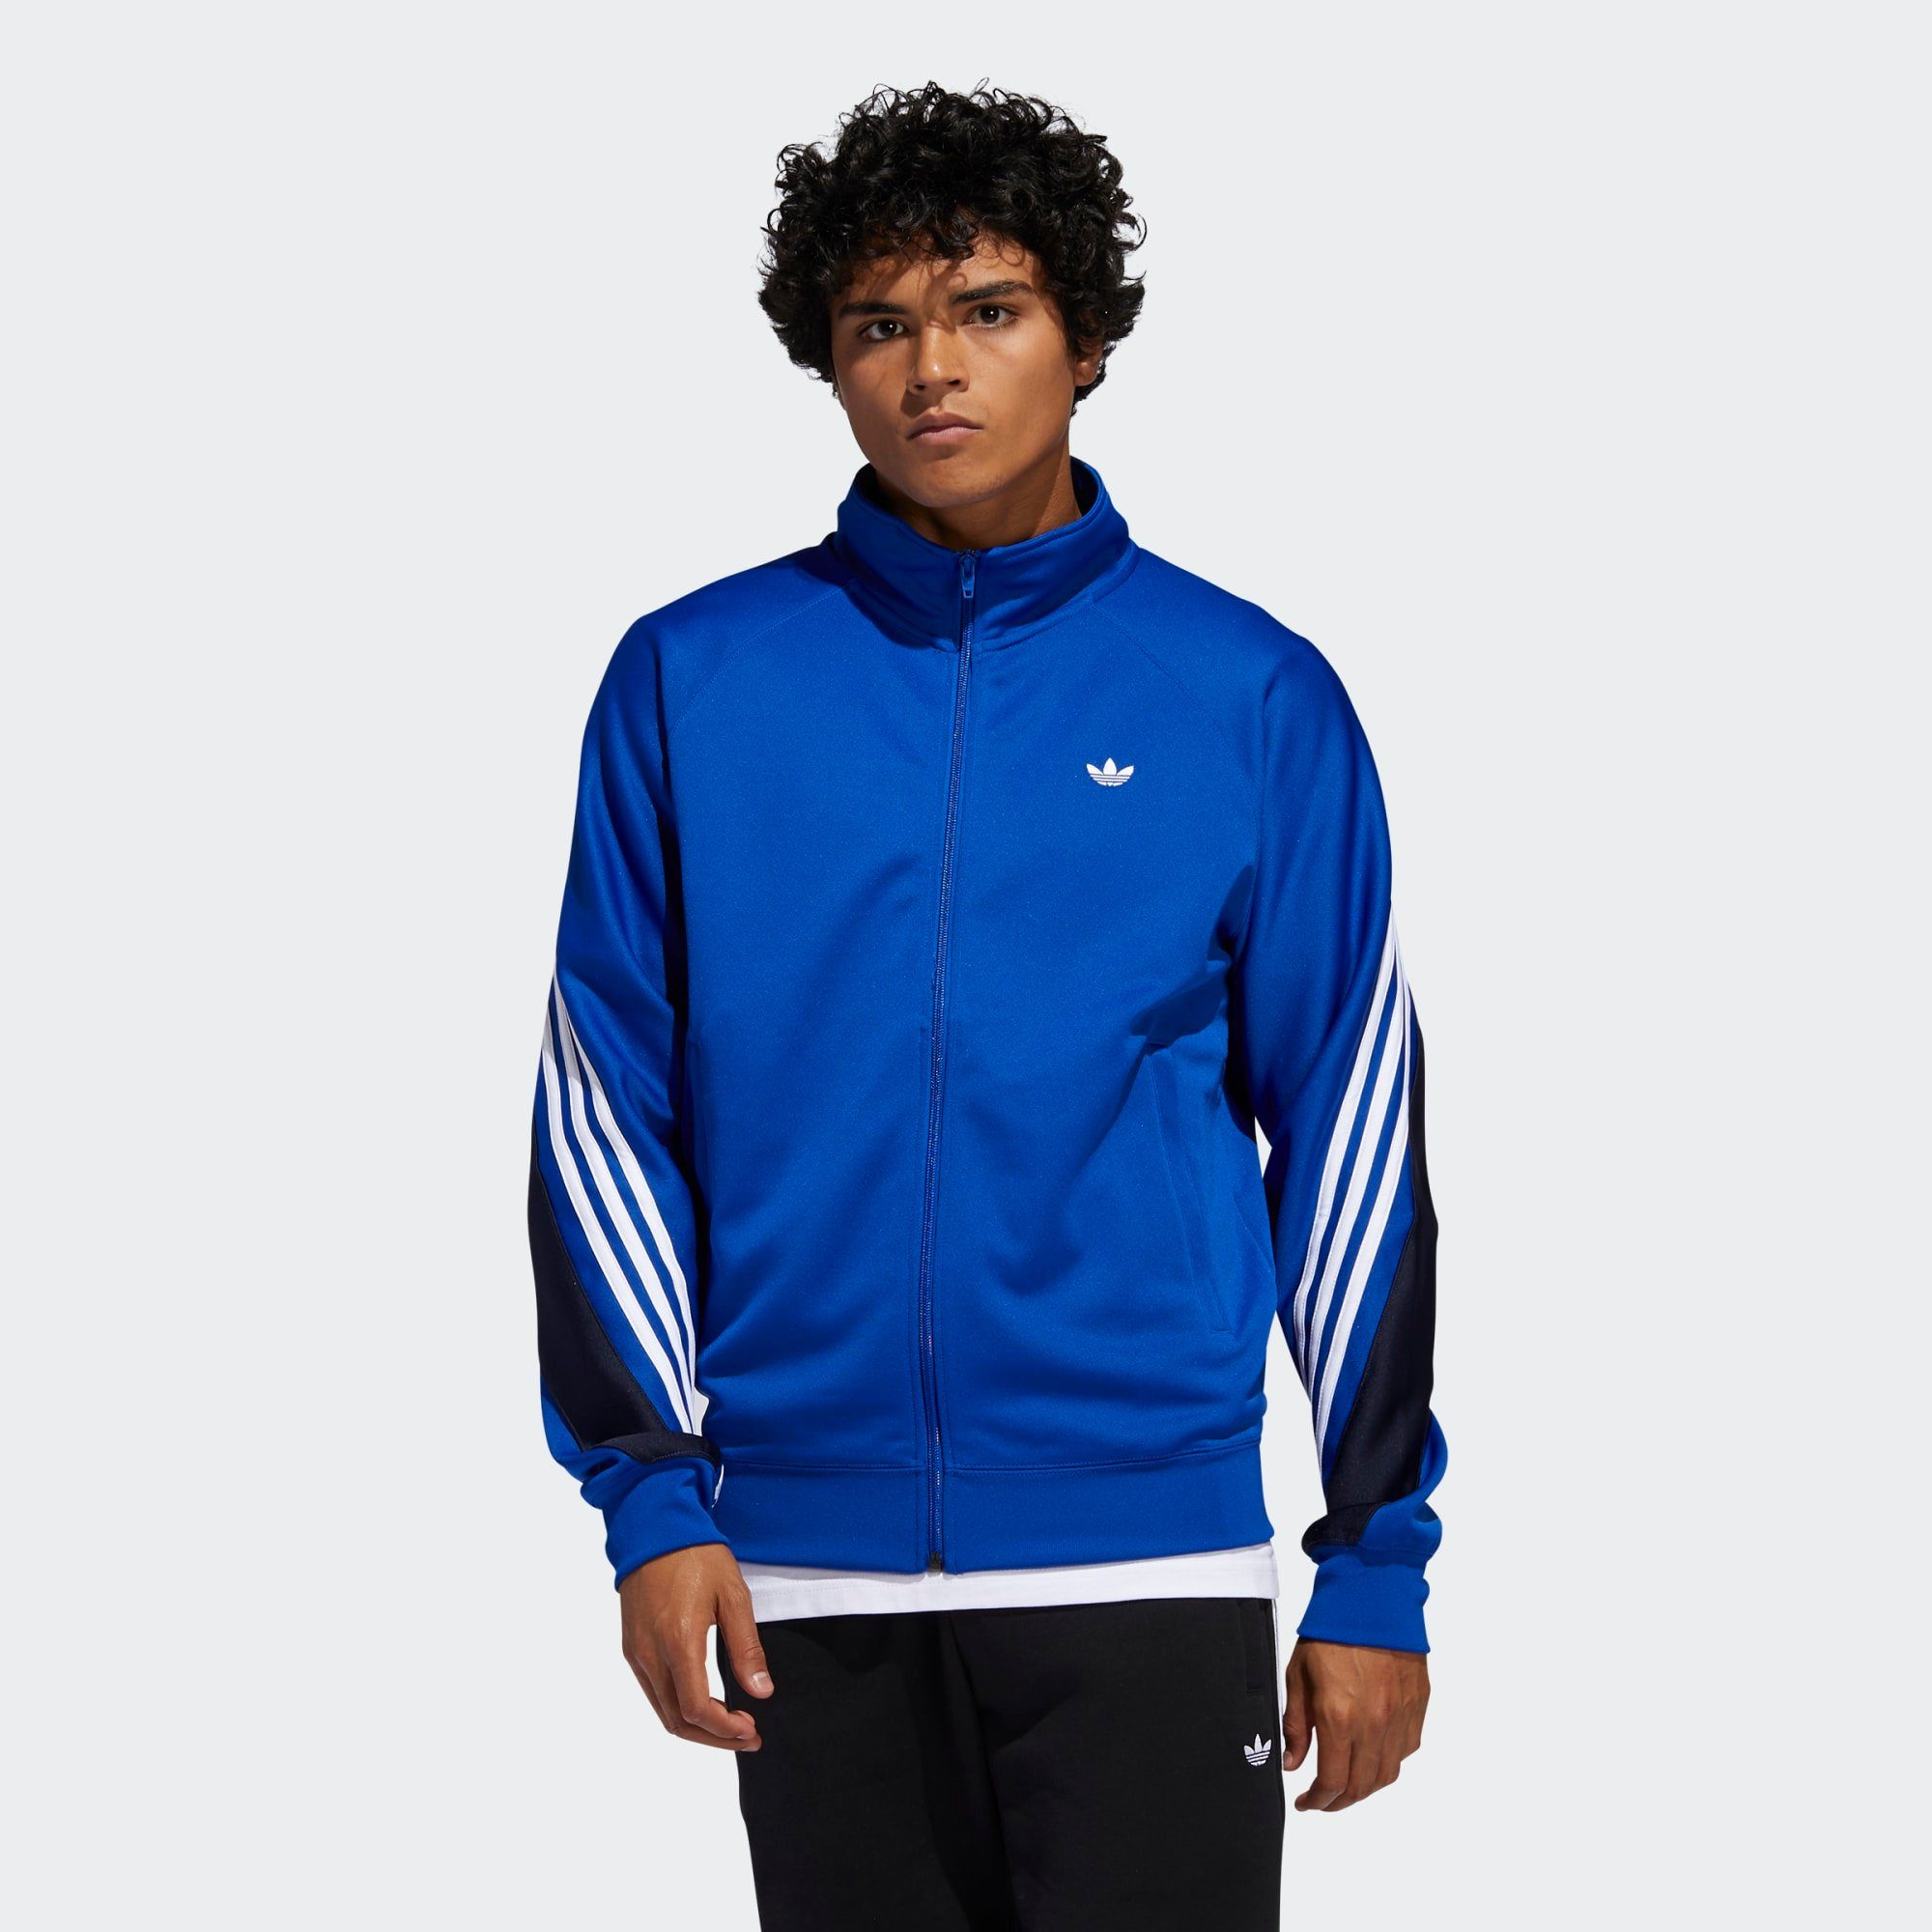 adidas Originals Sweatjacke 3-Streifen Wrap Originals Jacke